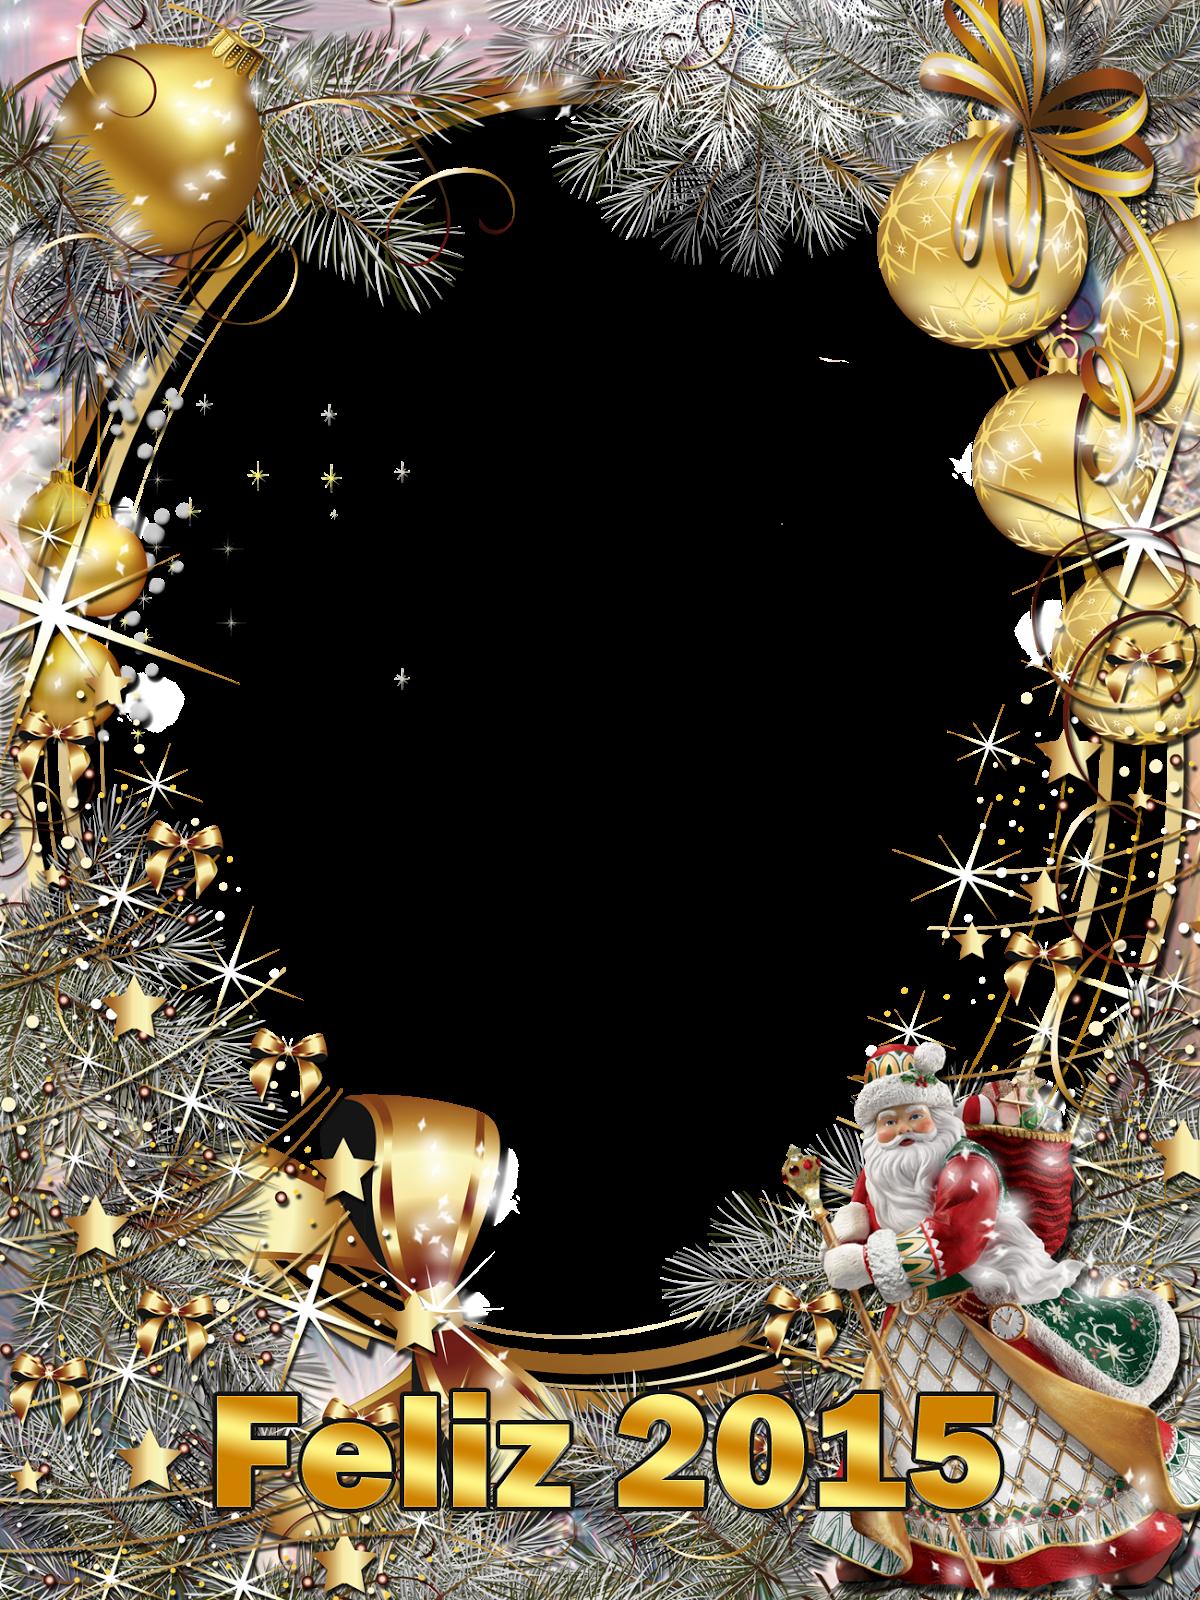 marco para fin de año